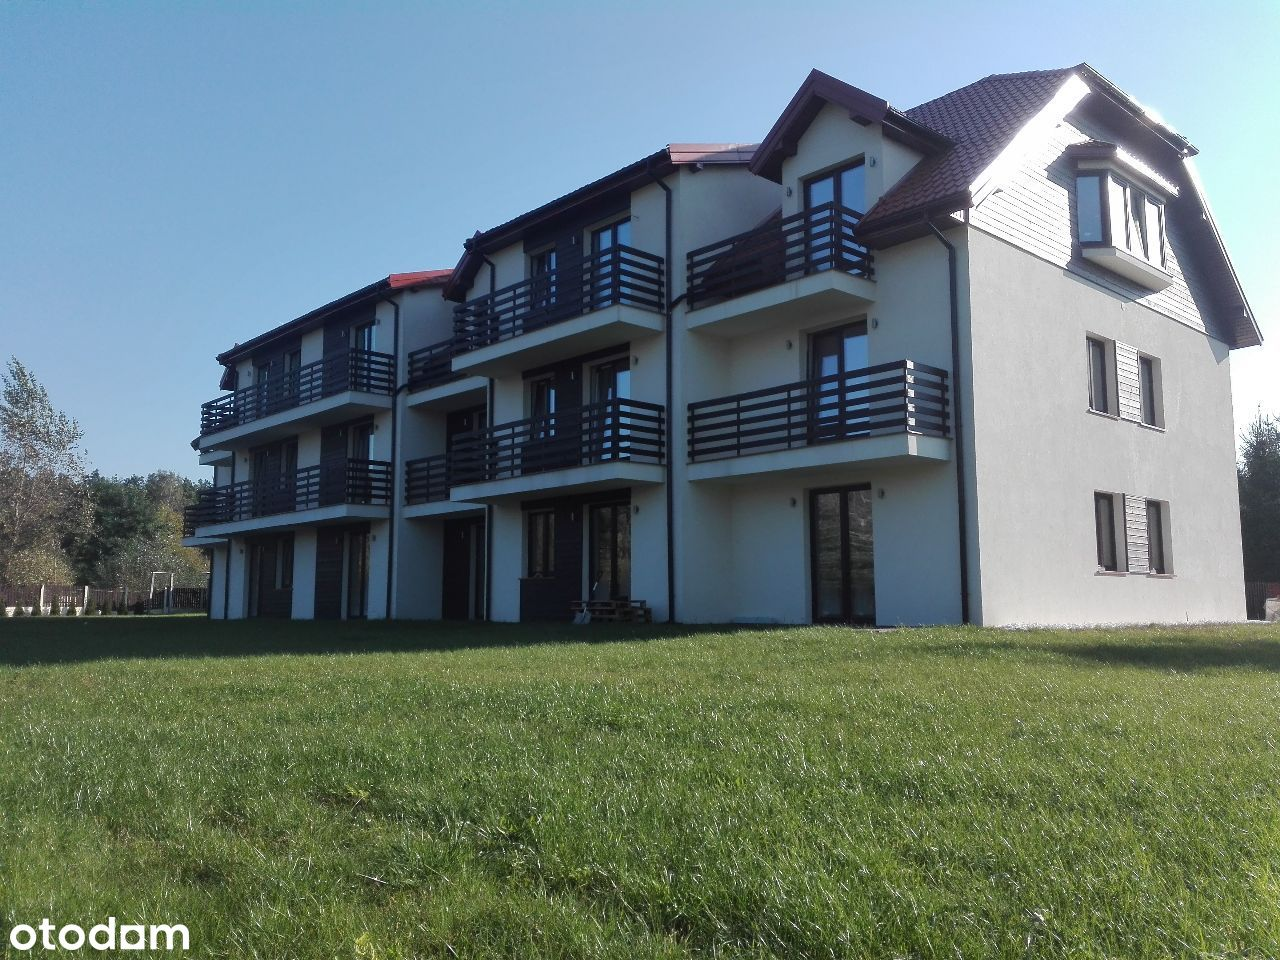 Struga, Super, ciche , 2 pokoje z dużym balkonem